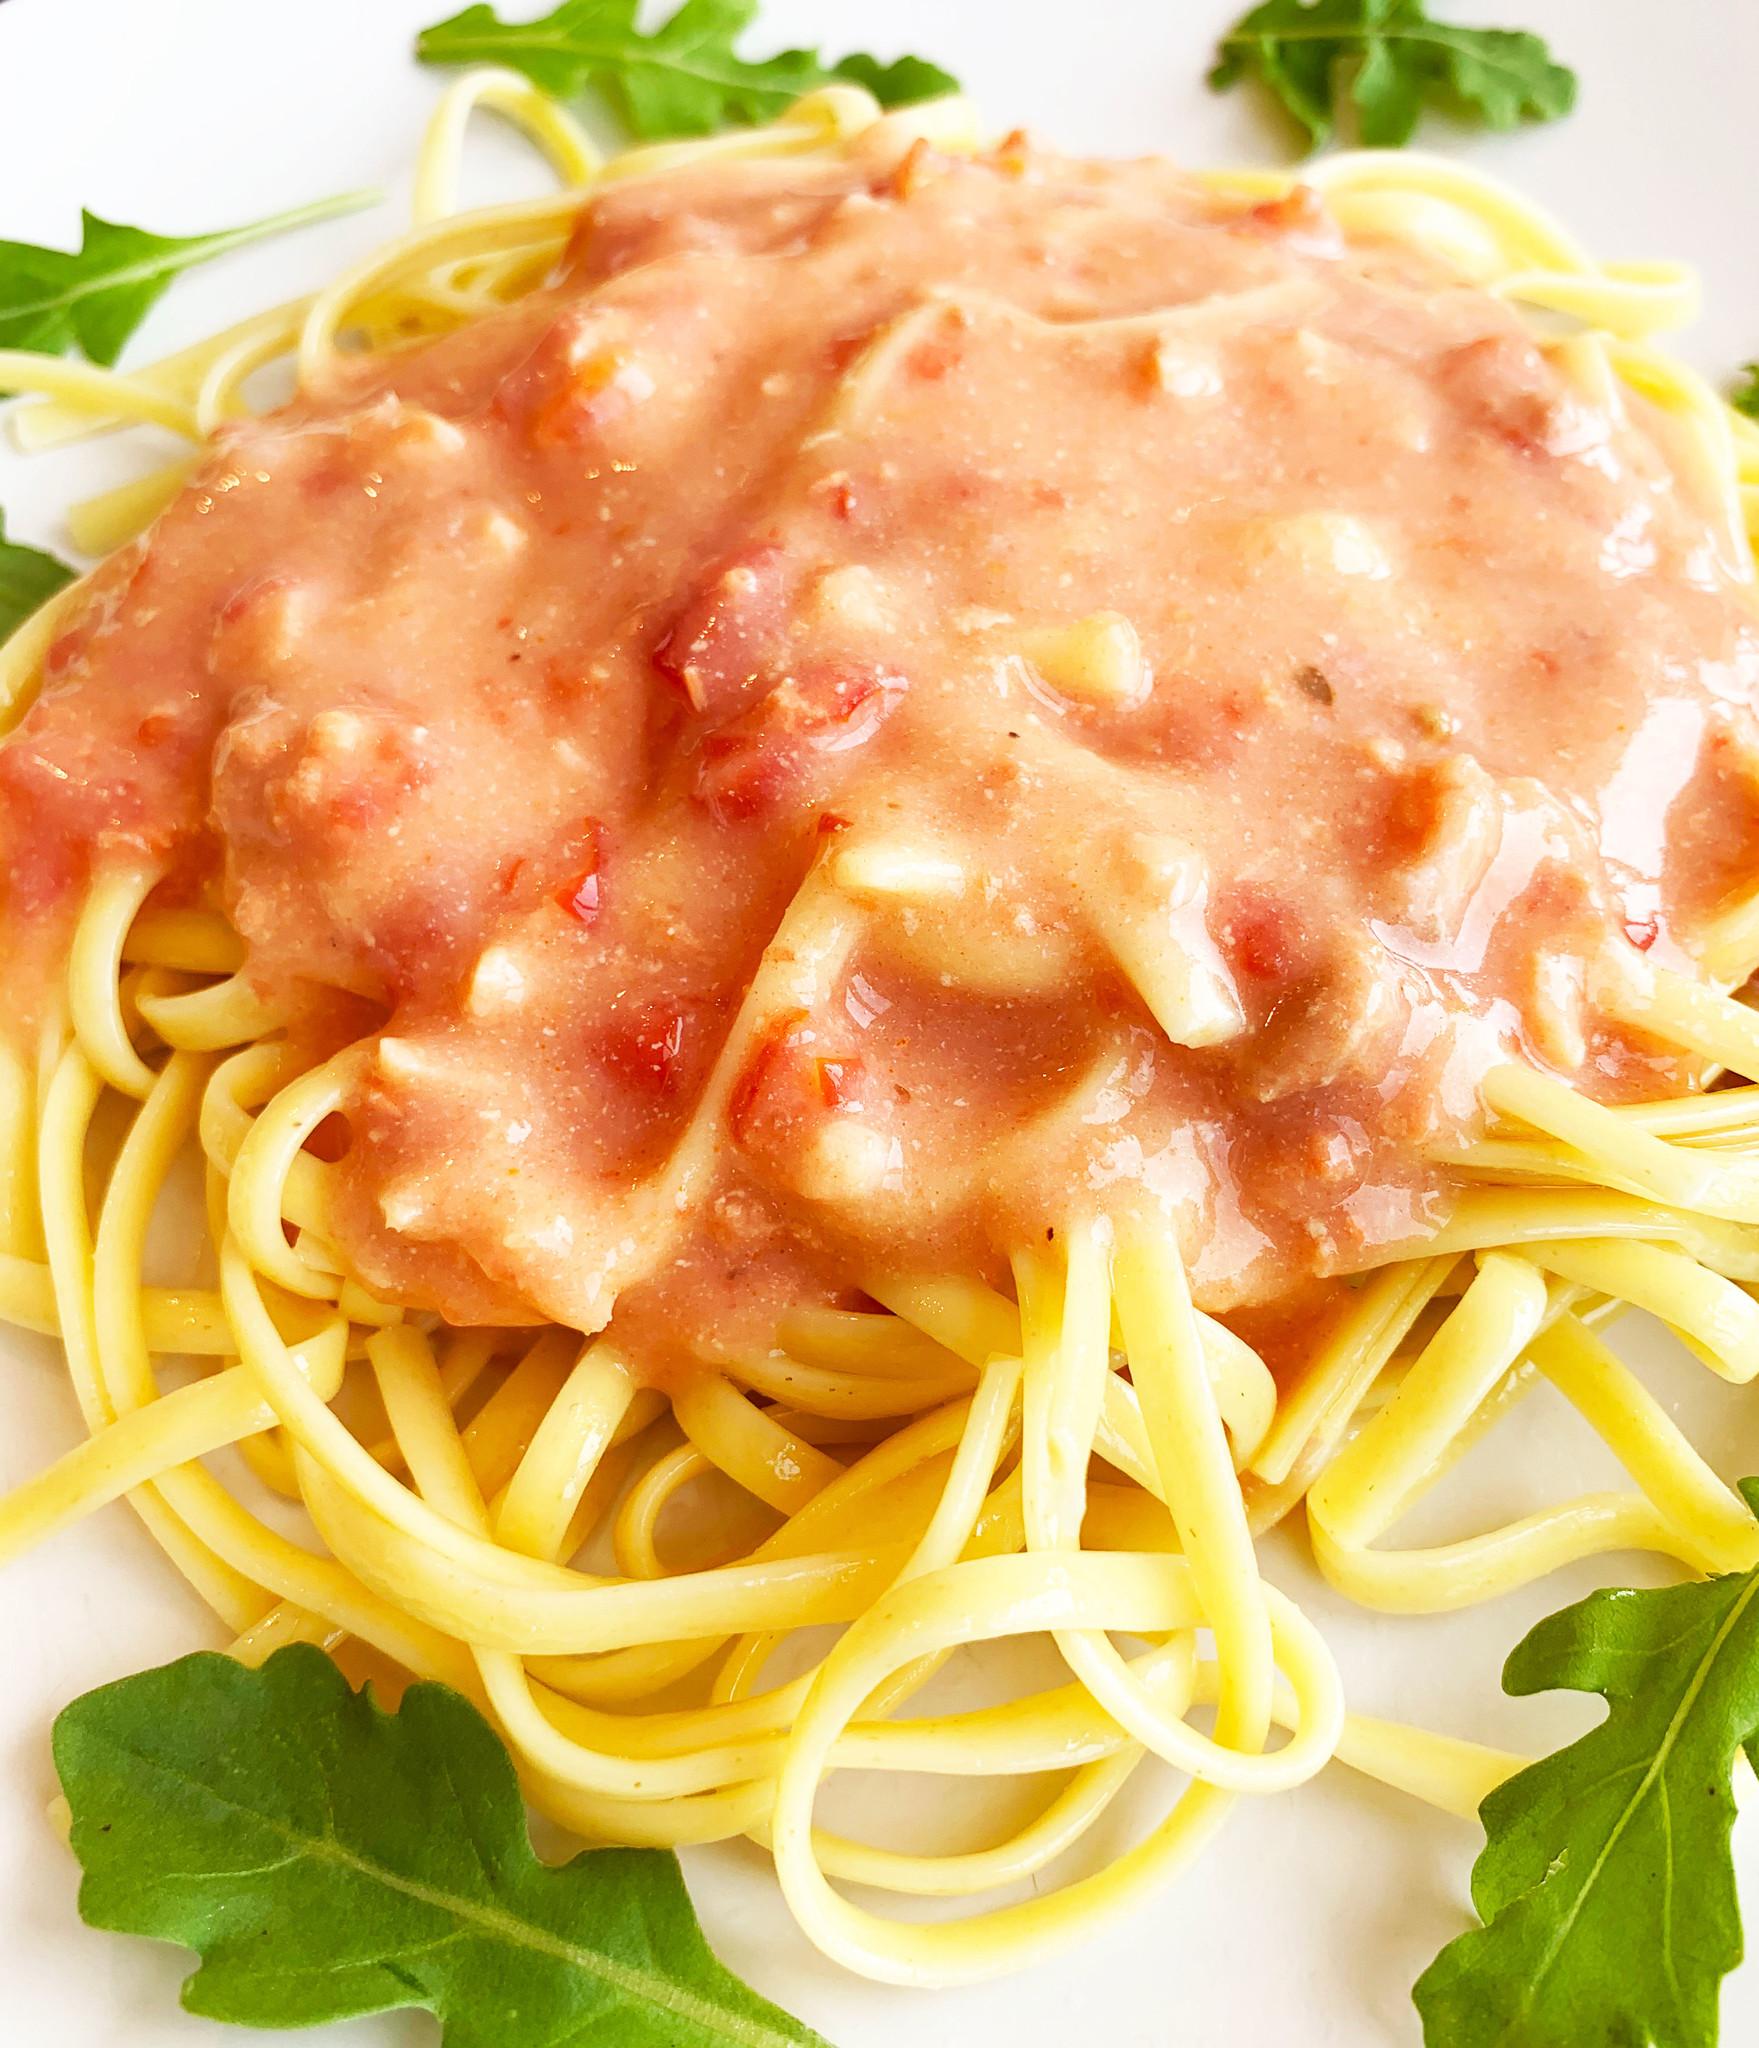 Two-salmon linguini & pink sauce (325g)